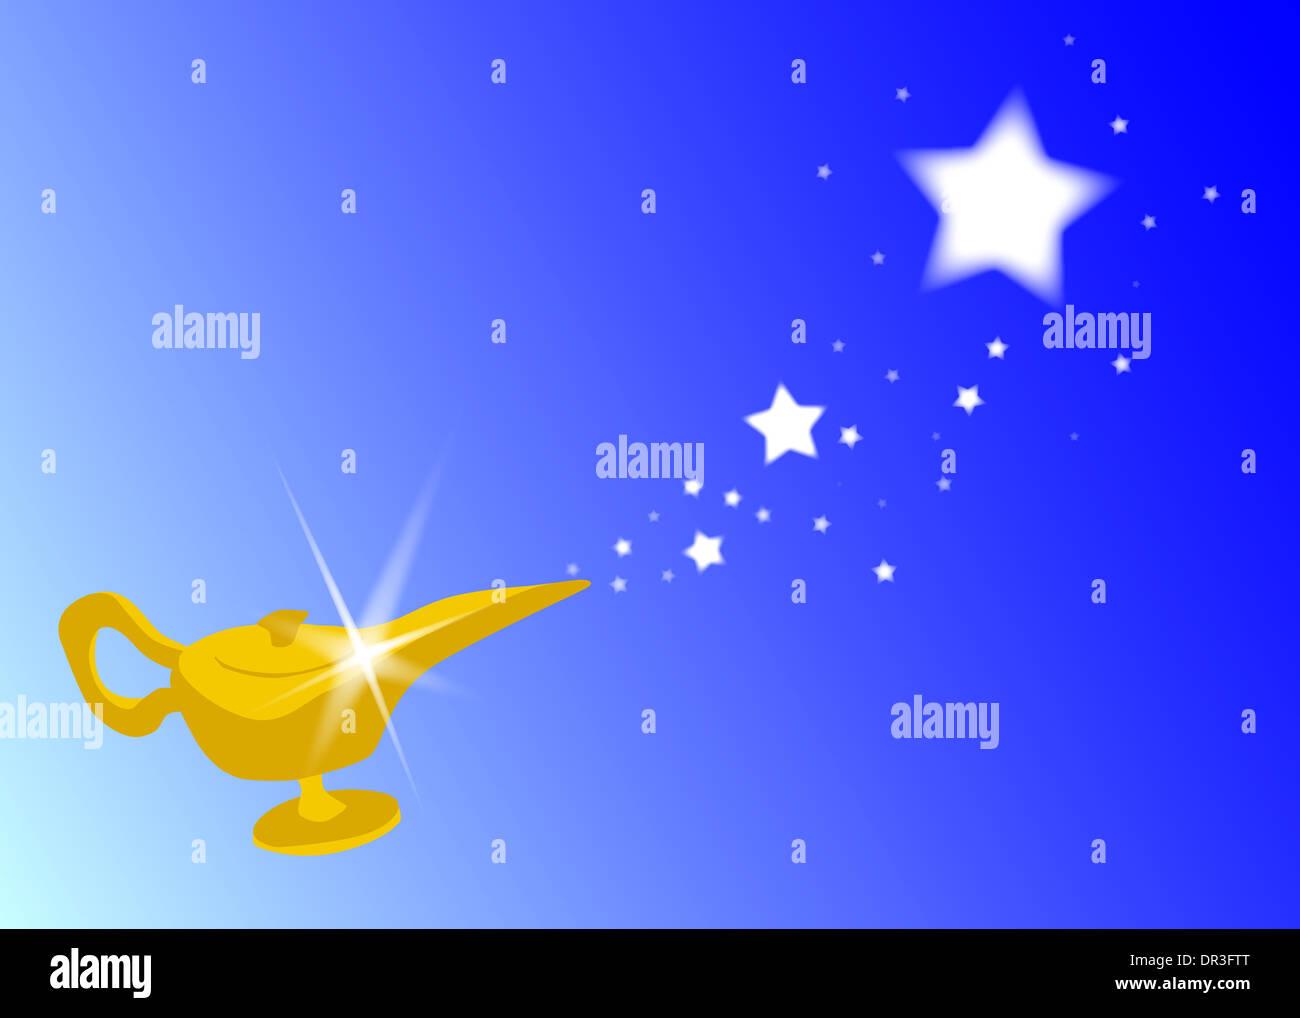 The Magic Lamp From The Arabian Nights